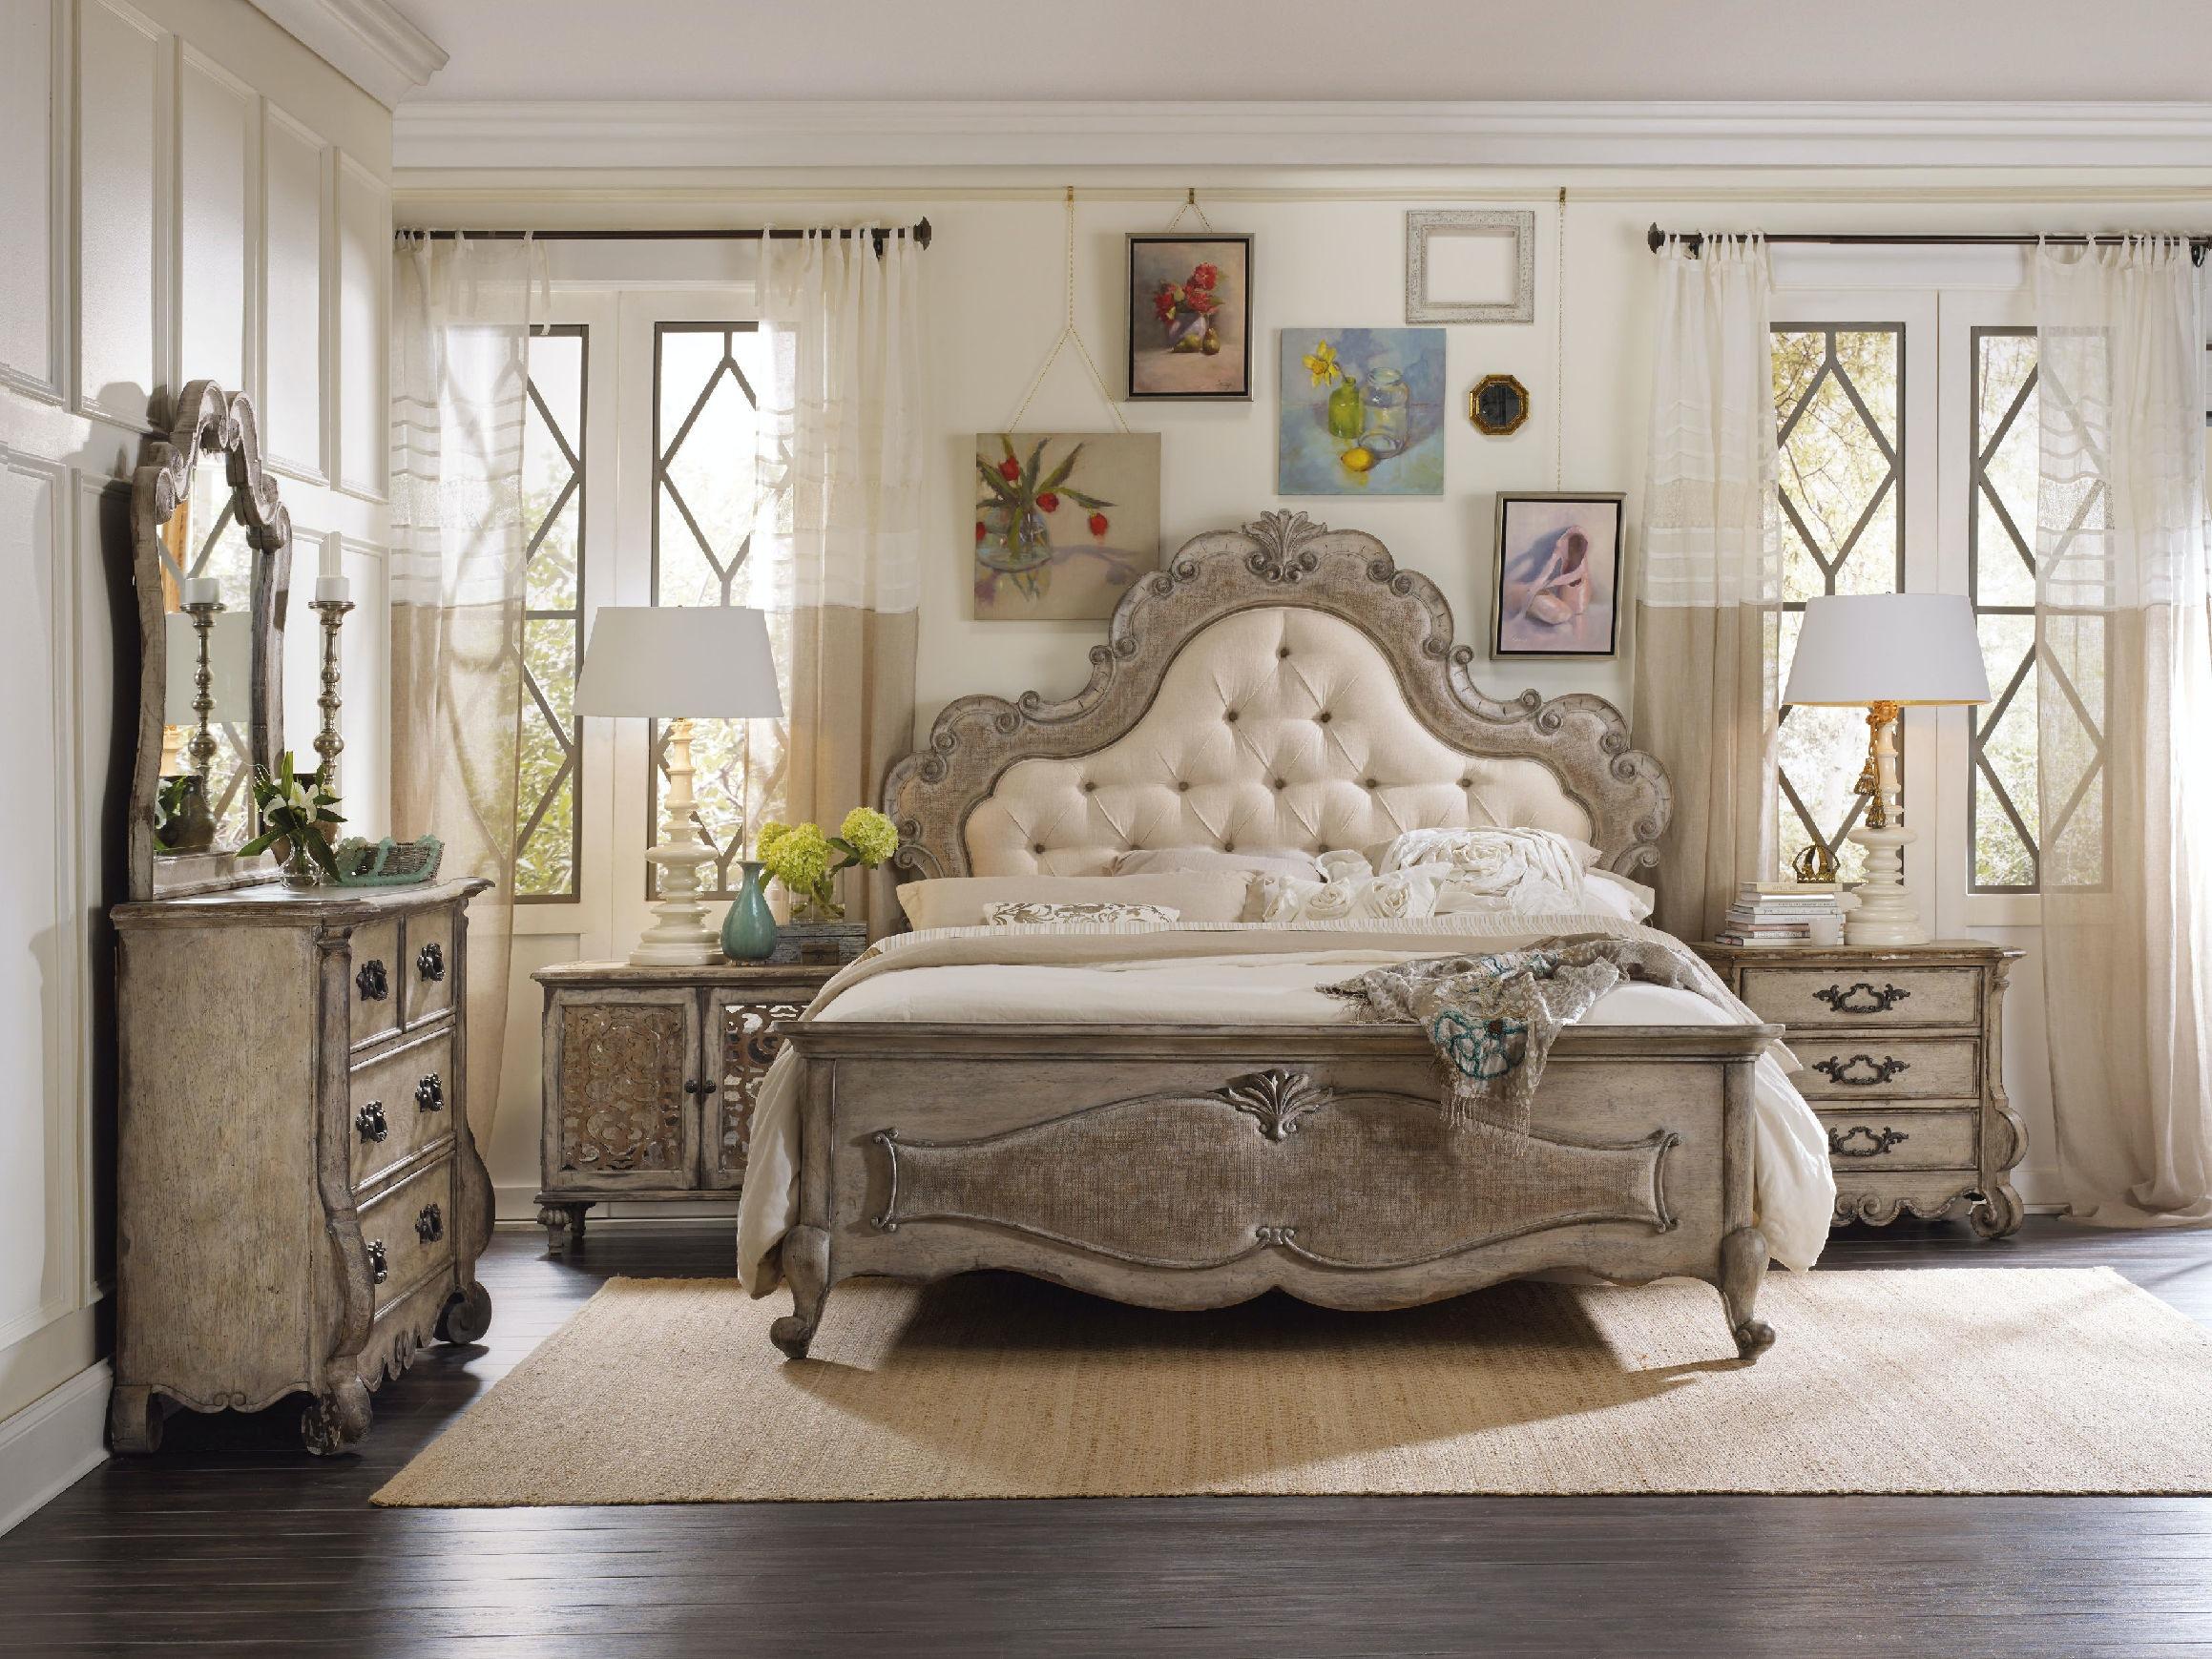 bedroom media chest. Hooker Furniture Chatelet Media Chest 5350 90011 Bedroom